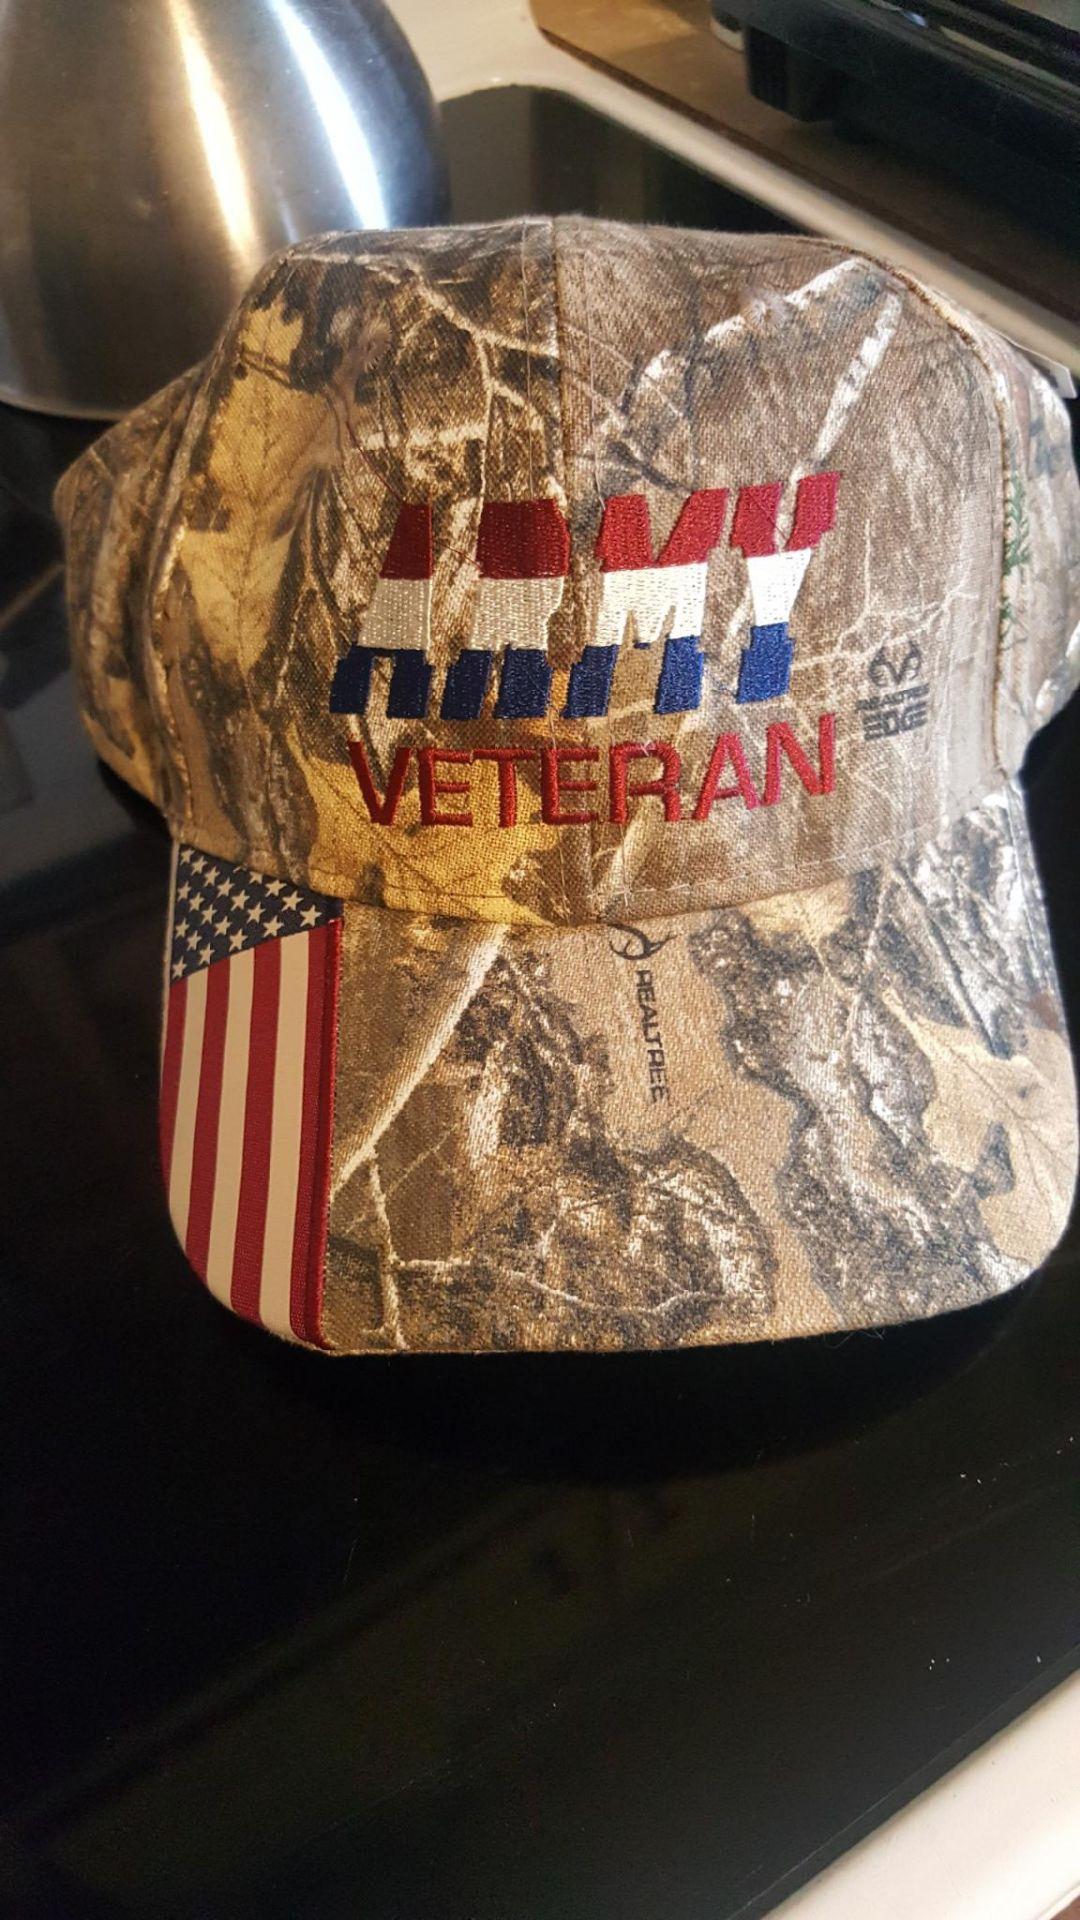 army-vet